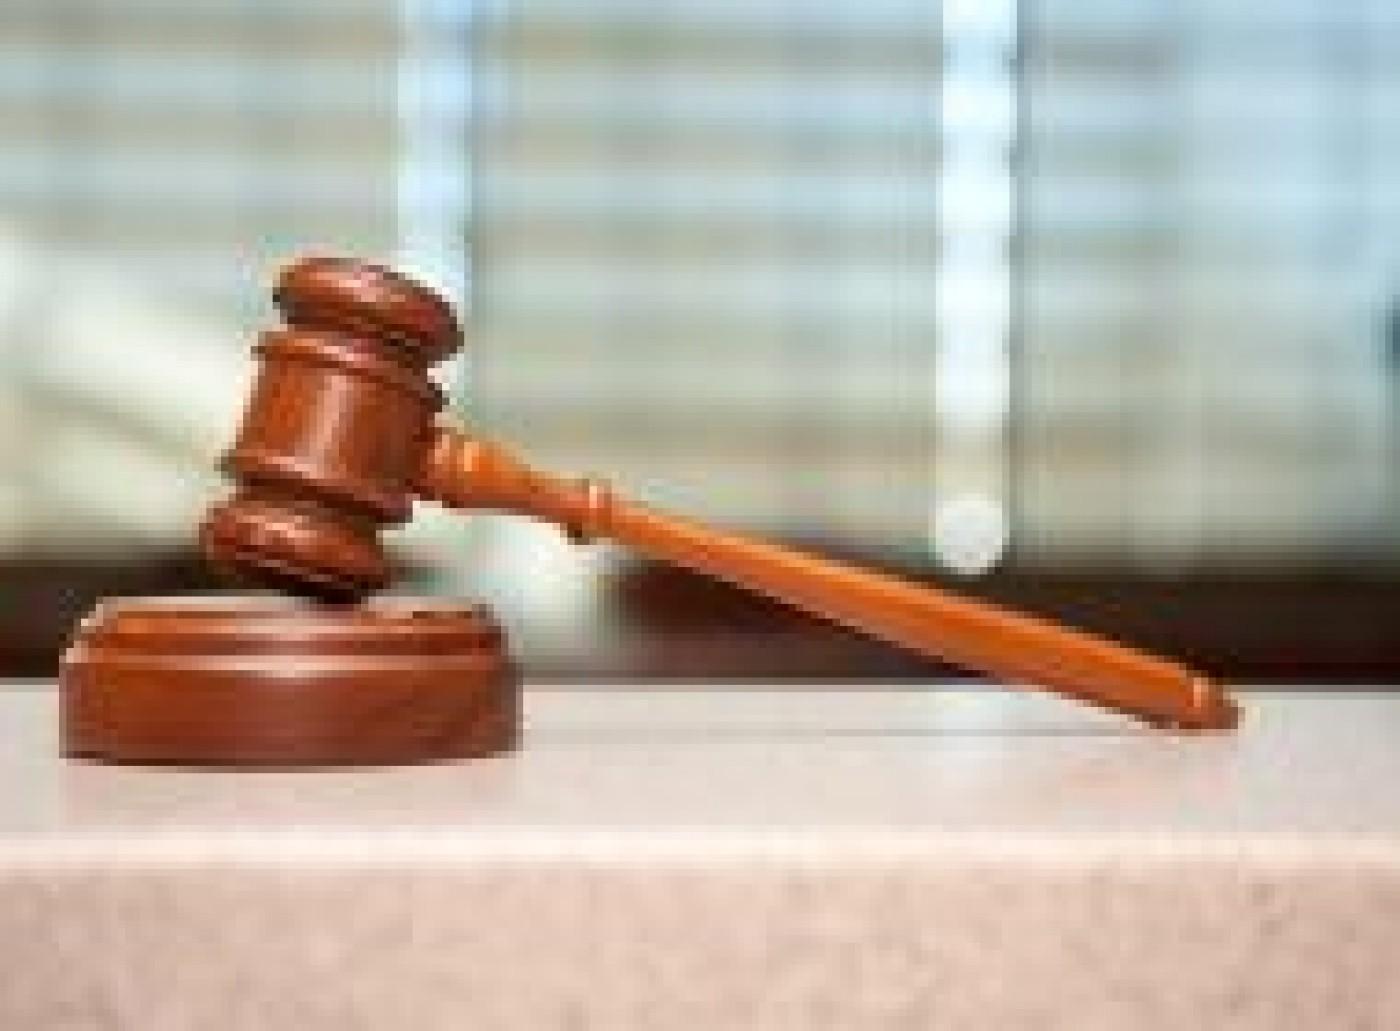 Mare Nostrum Legal Firm & Property Management Costa Blanca & Costa Cálida